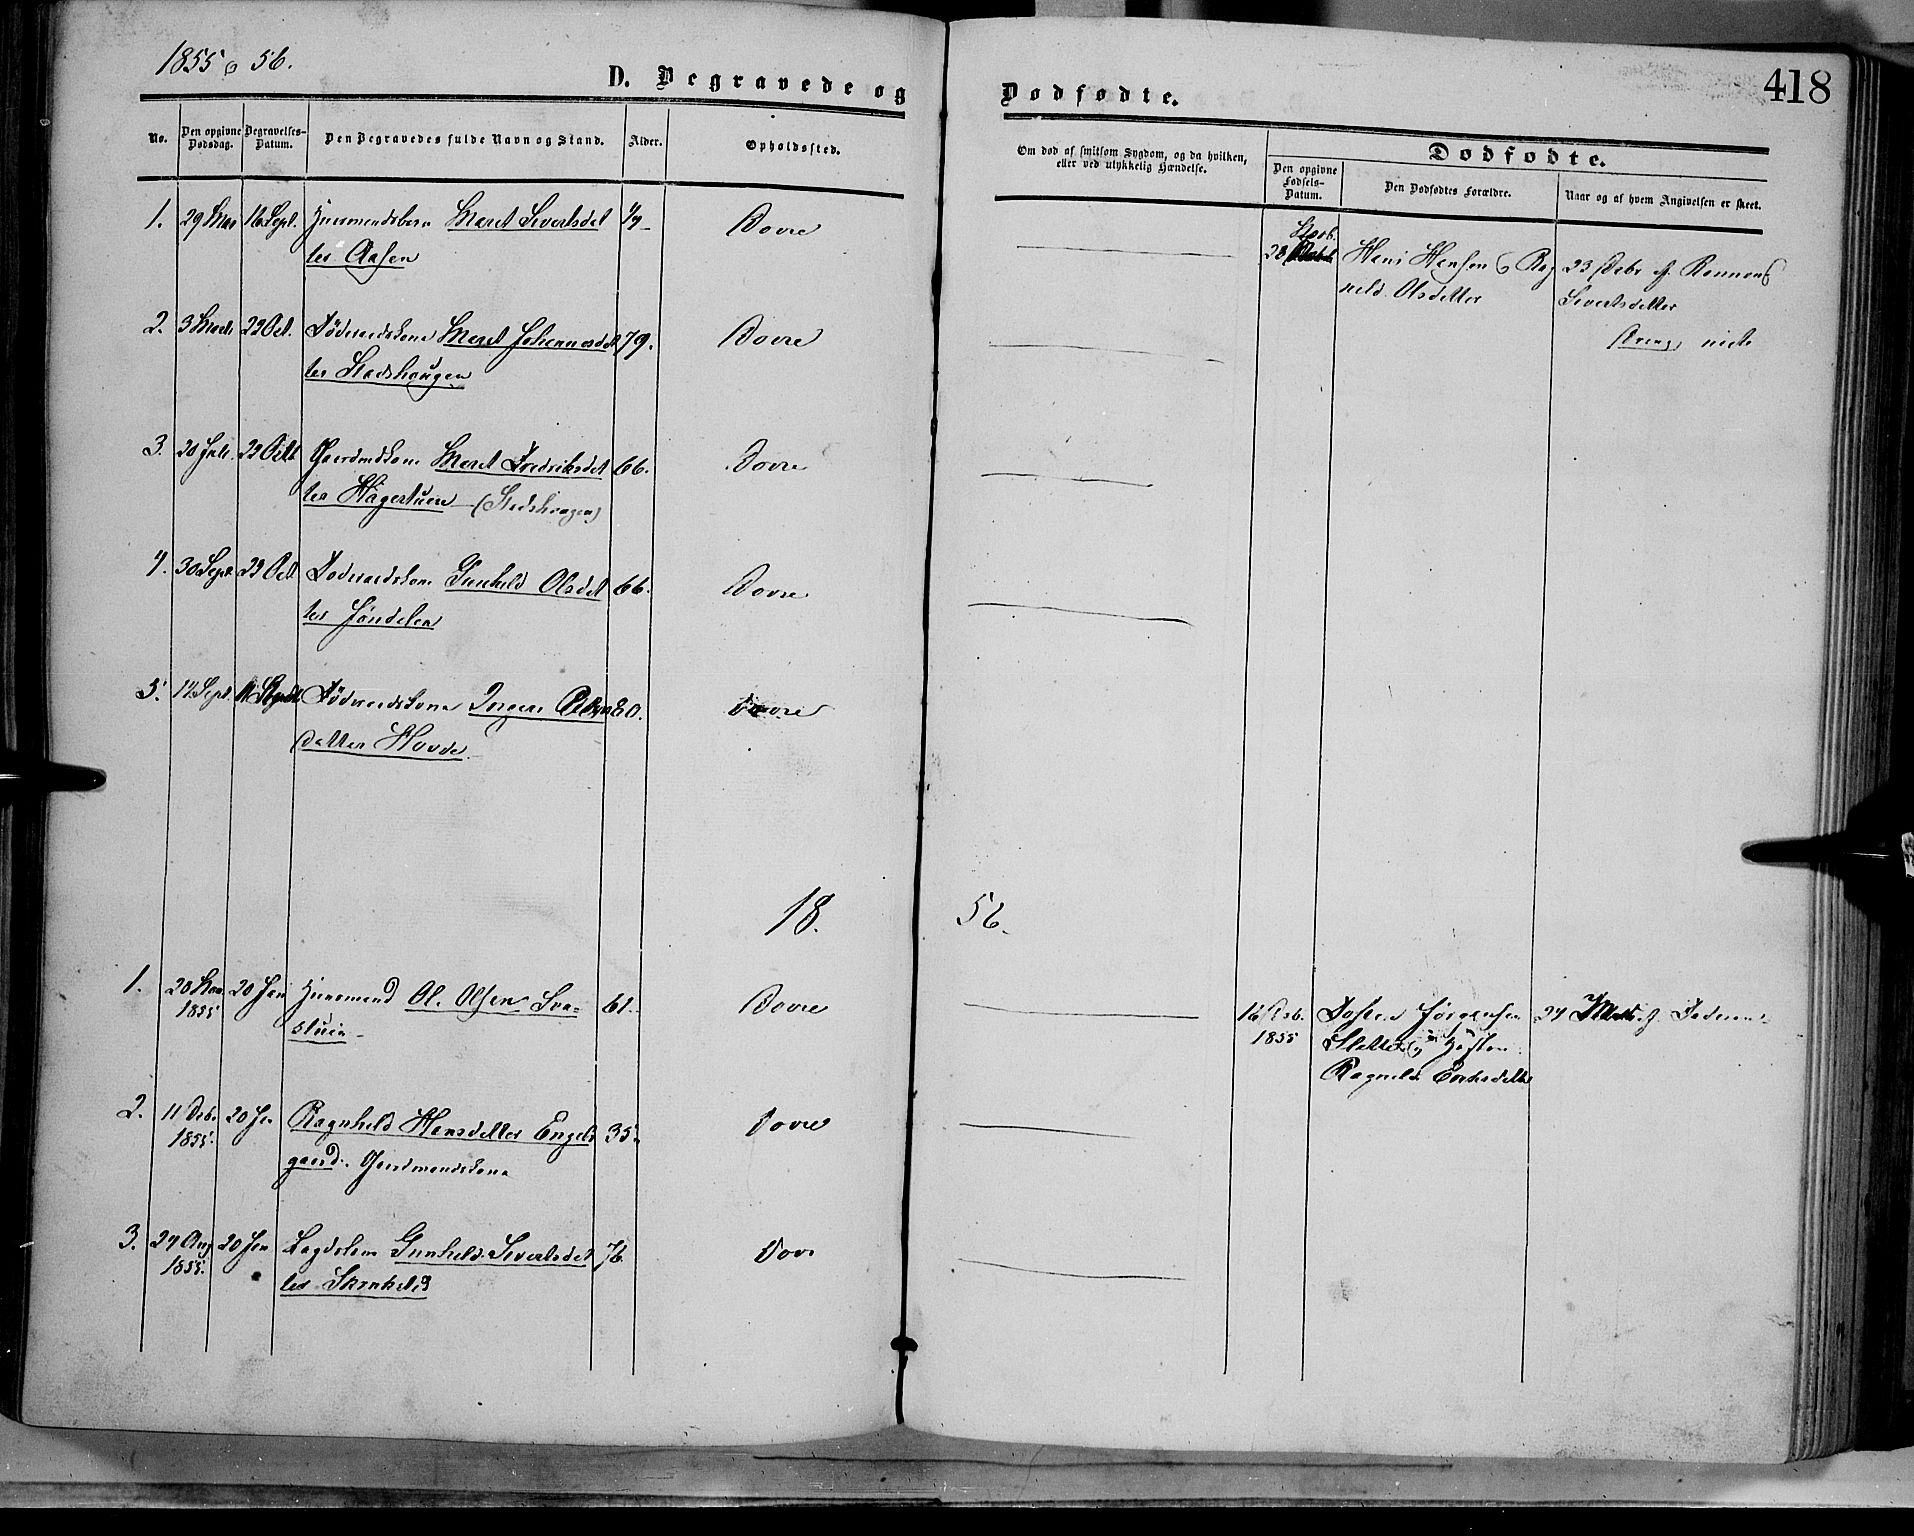 SAH, Dovre prestekontor, Ministerialbok nr. 1, 1854-1878, s. 418